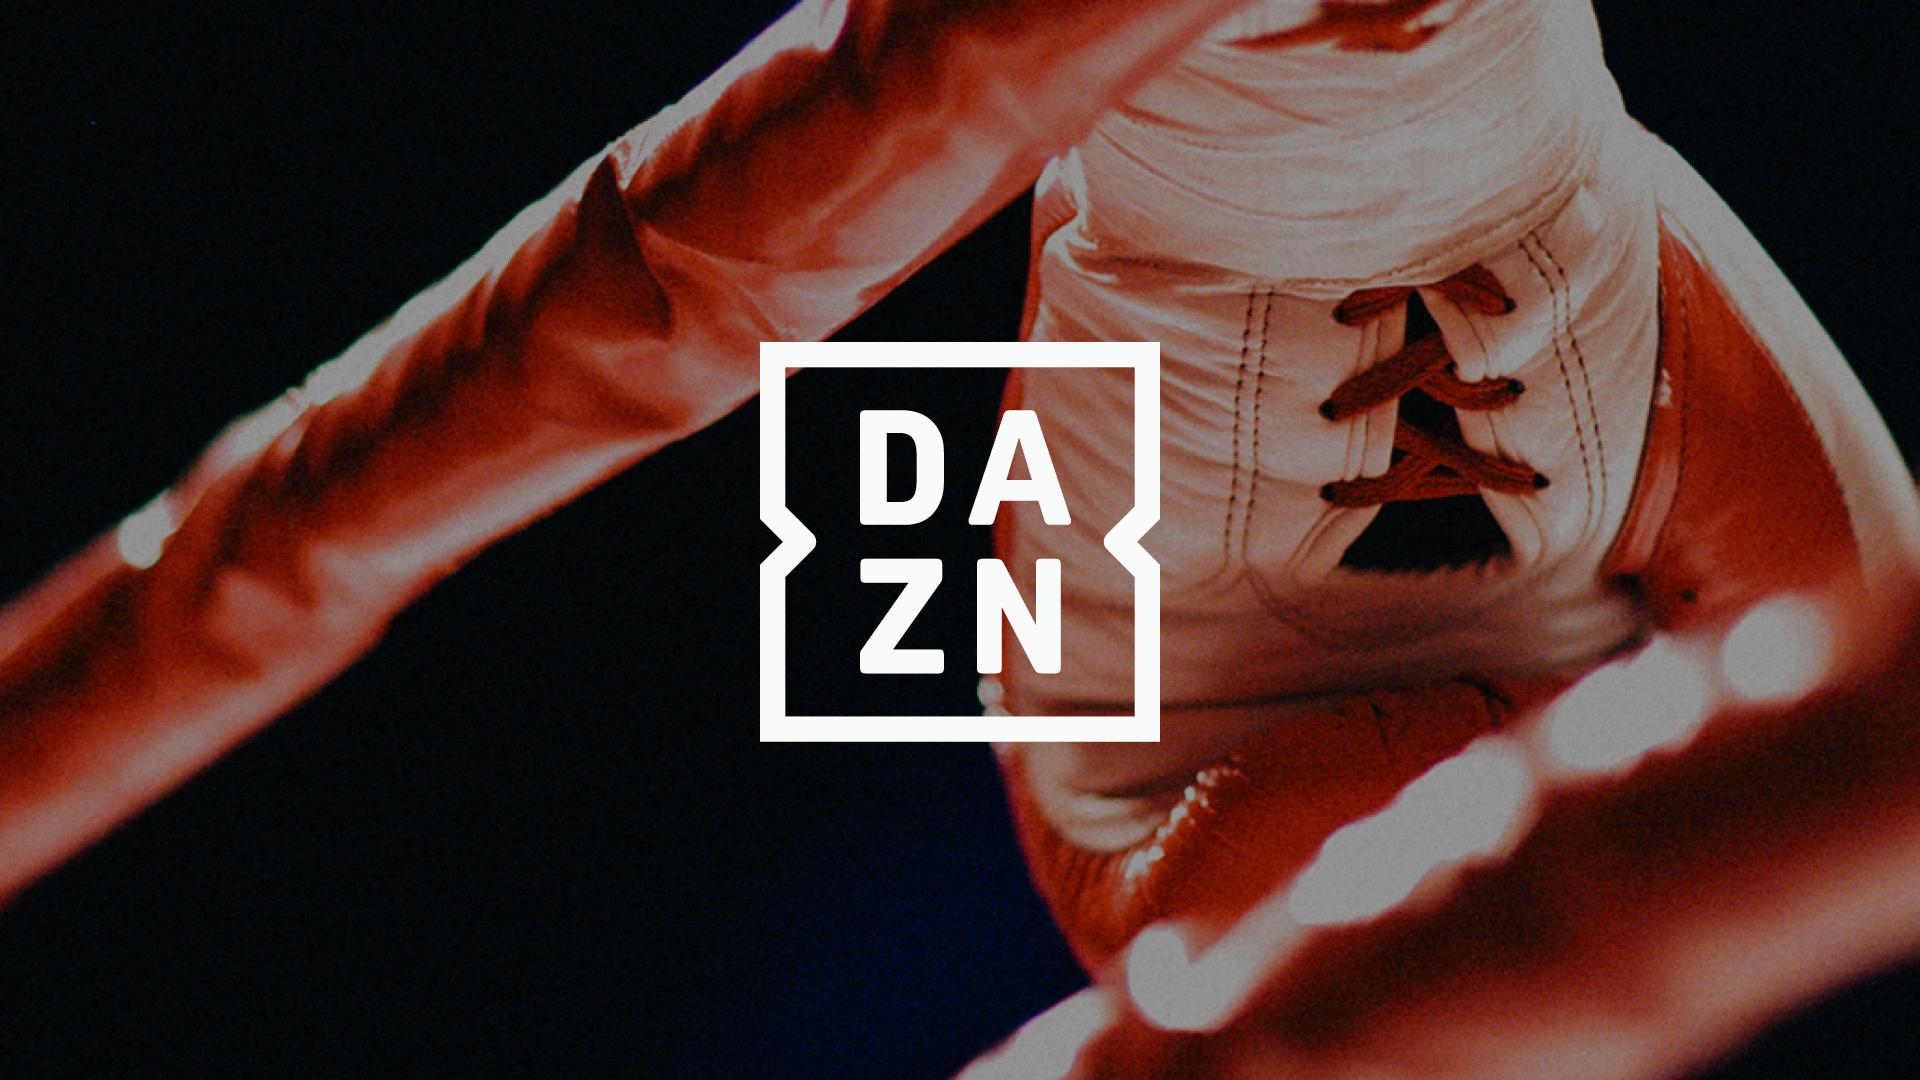 DAZN_16x9_Logo_FTR